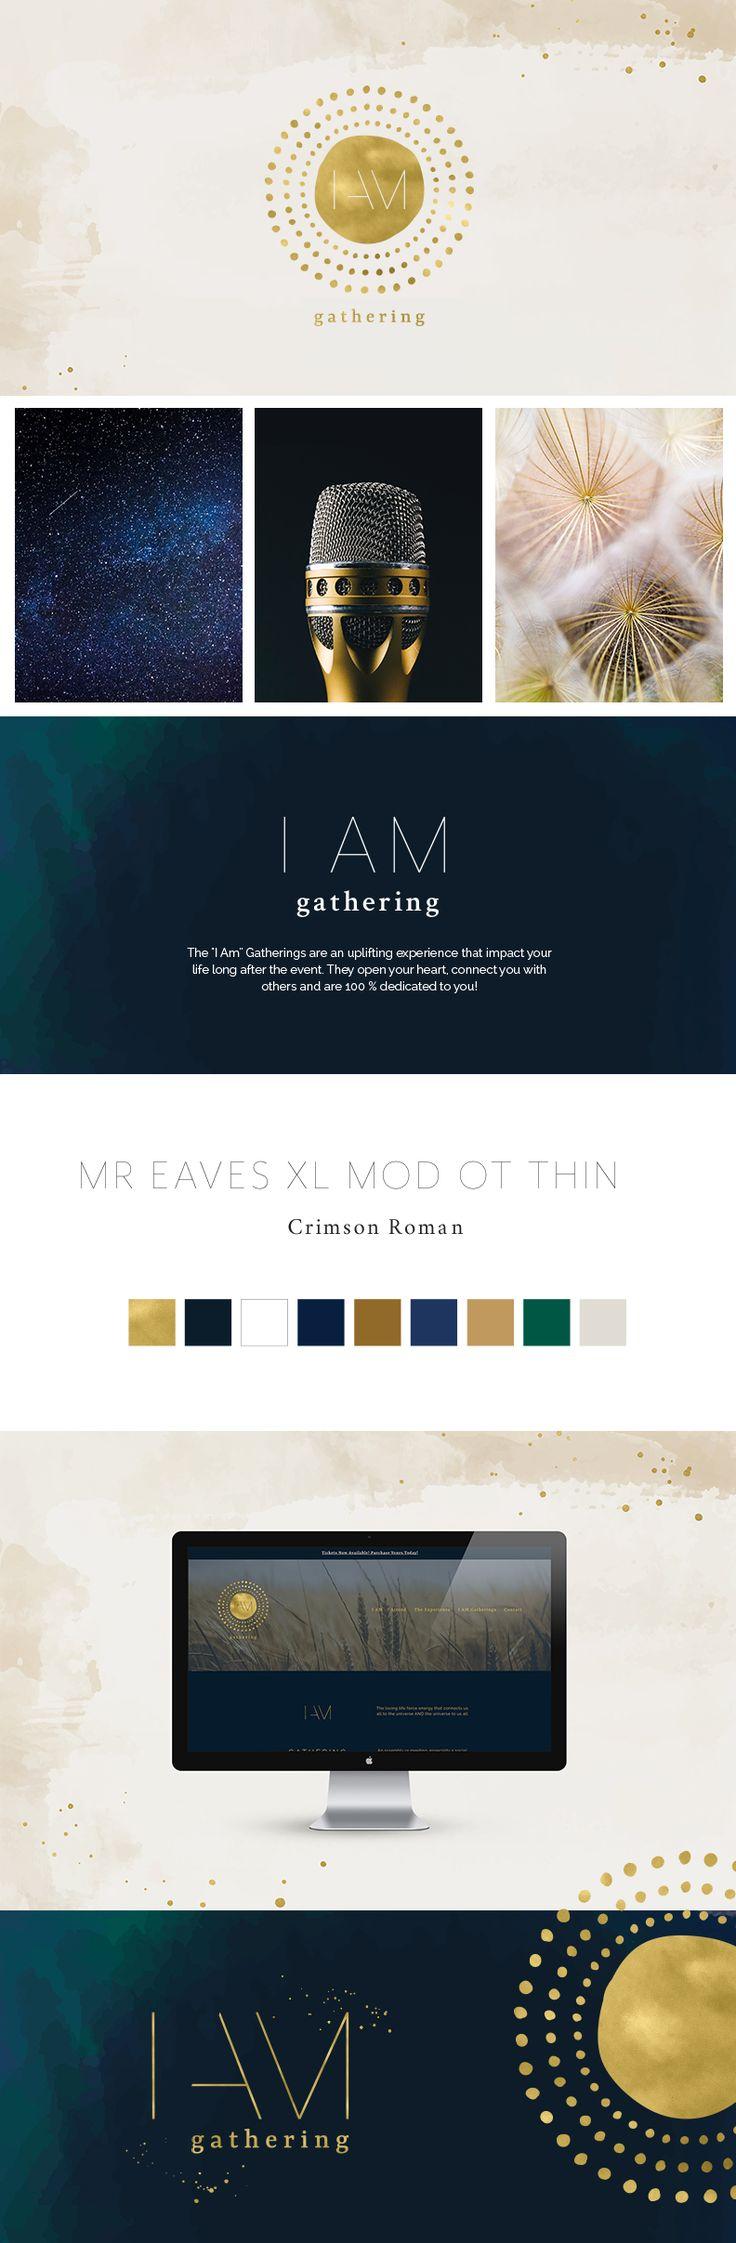 Branding & Website for I AM Gathering. #graphicdesign #branding #websitedesign #CreatedbyFicus